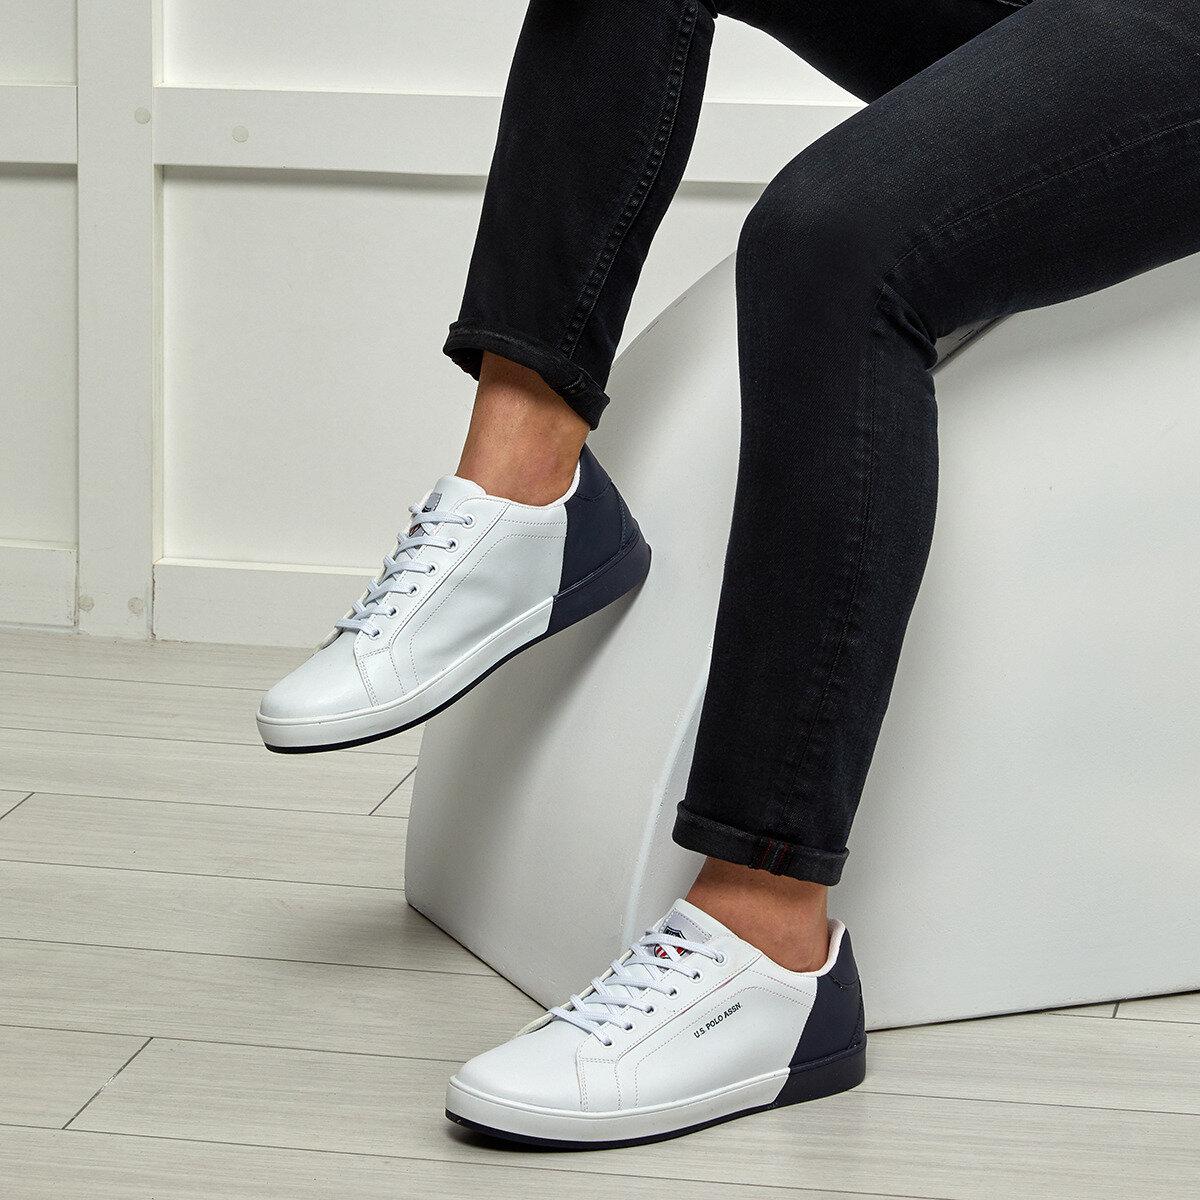 FLO LEXI White Male Sneaker U.S. POLO ASSN.